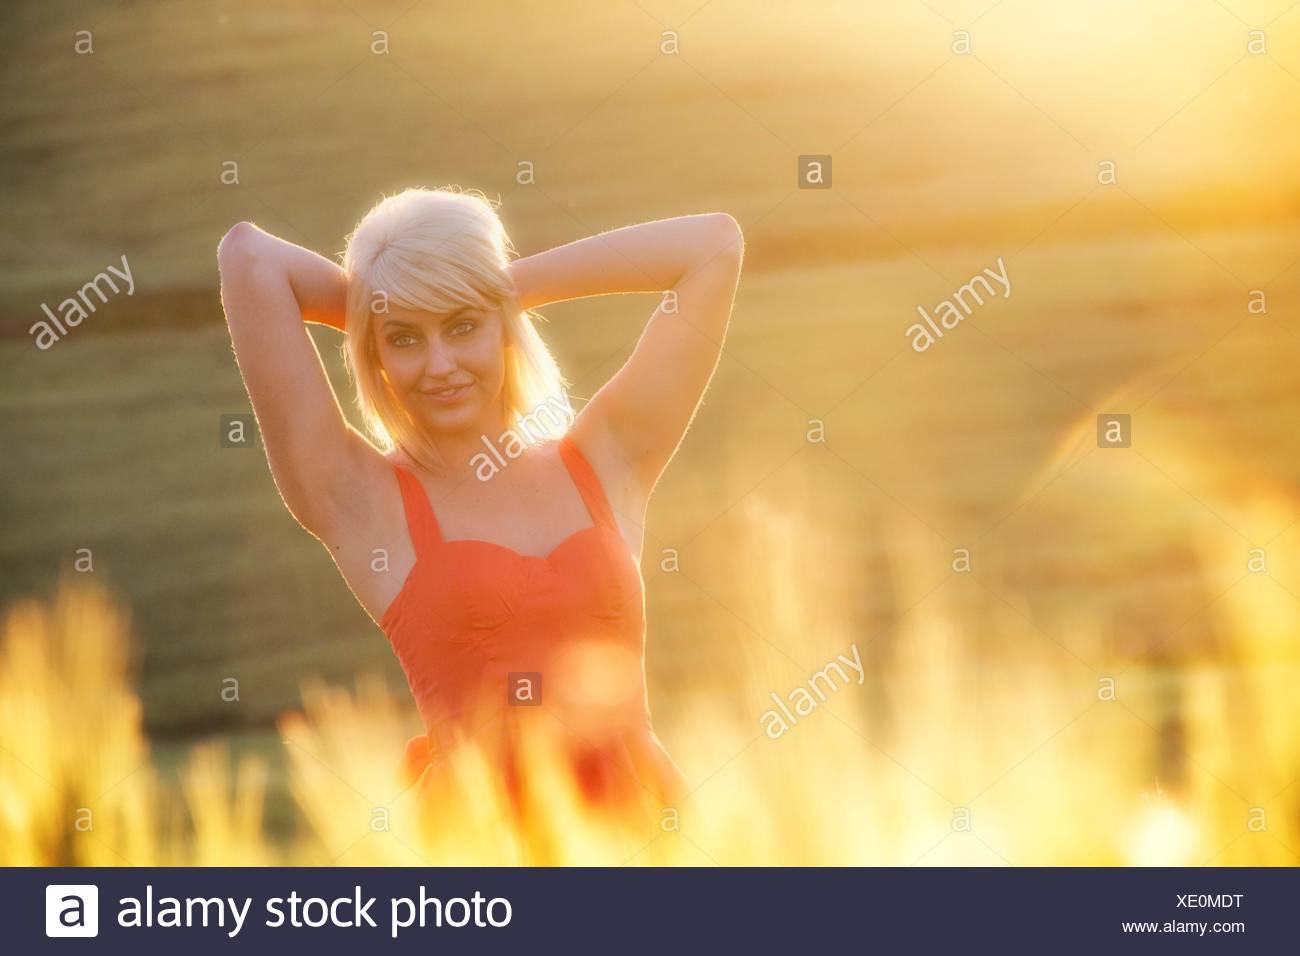 A young woman outdoors in a wheat field, Spokane, Washington, USA. - Stock Image